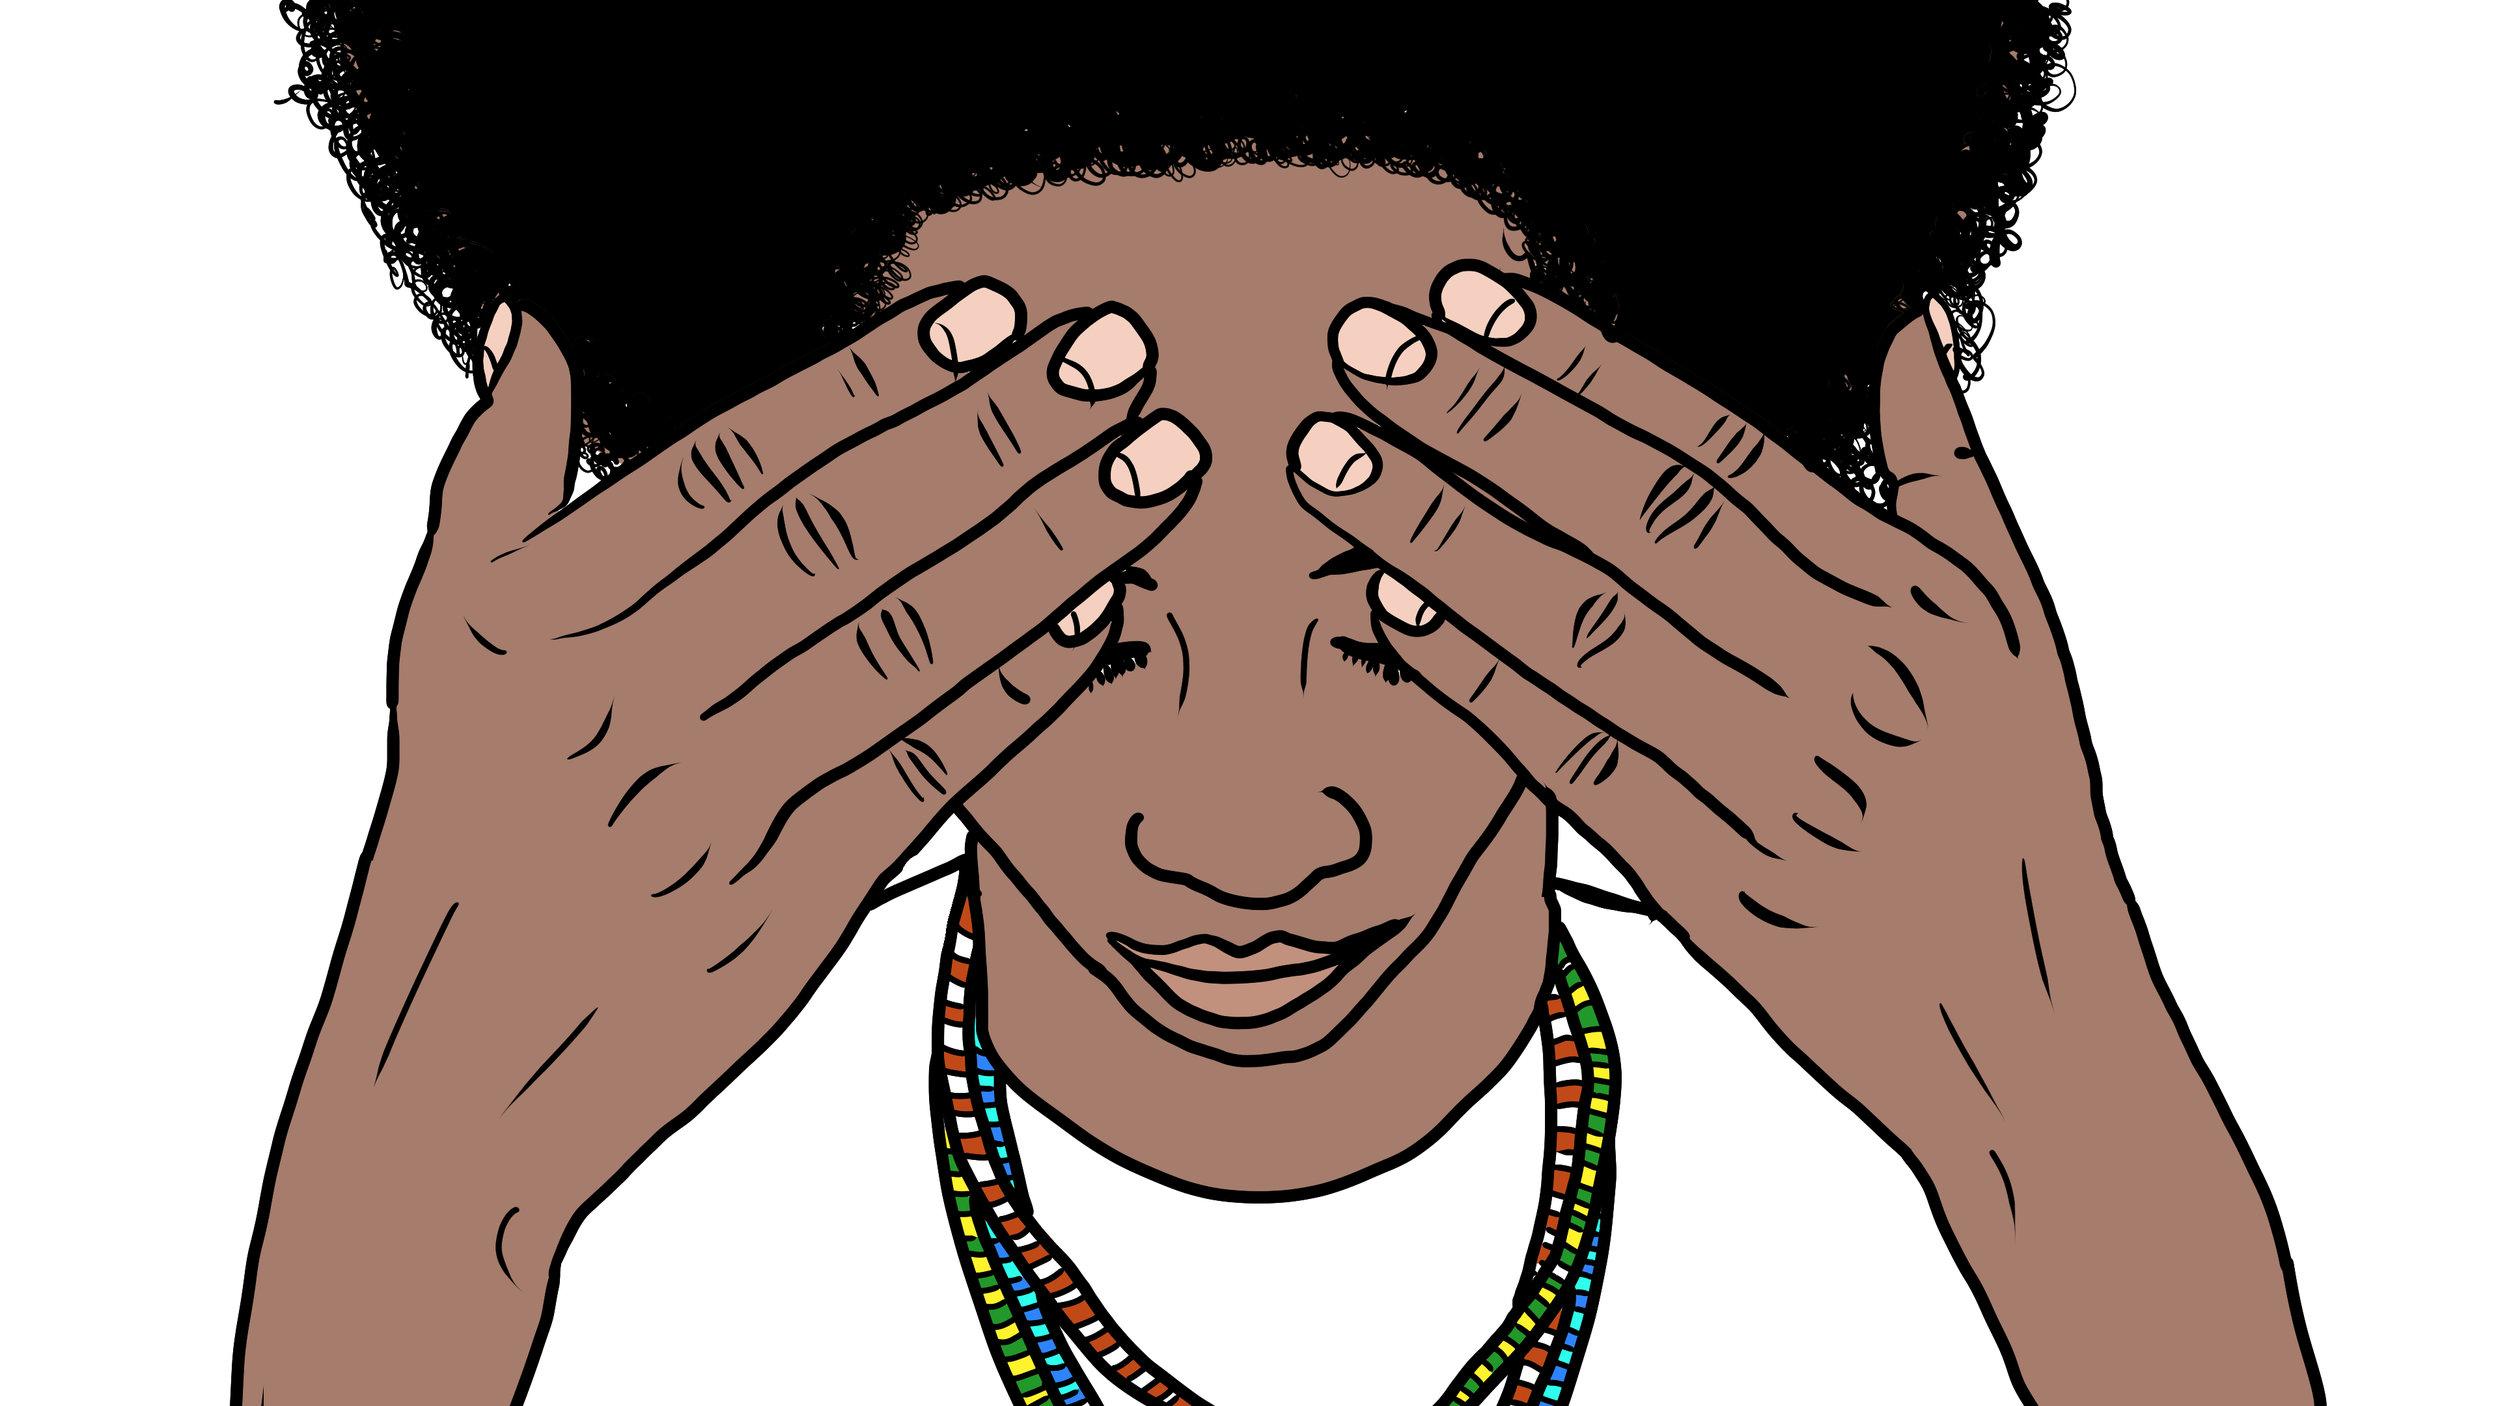 yoruba prayer, yoruba song, orisha prayer, orisa, adura, tokantokan, ioruba, lukumi, santeria